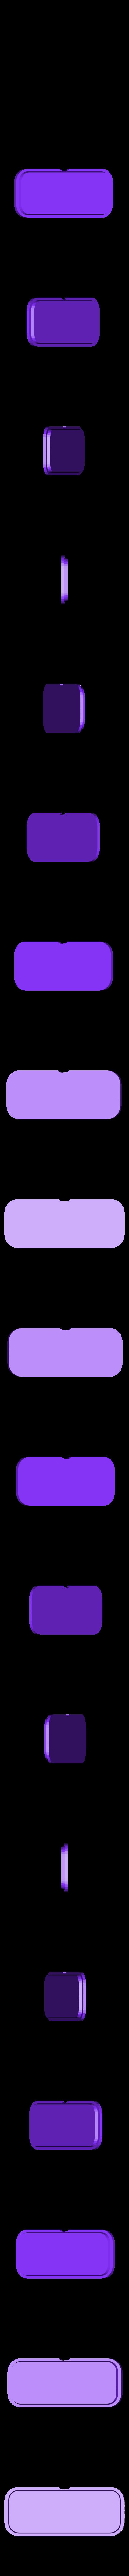 benq_dock_cover.STL Download free STL file BENQ GP2/GP3 iPhone dock cover • 3D printable model, Istareyn